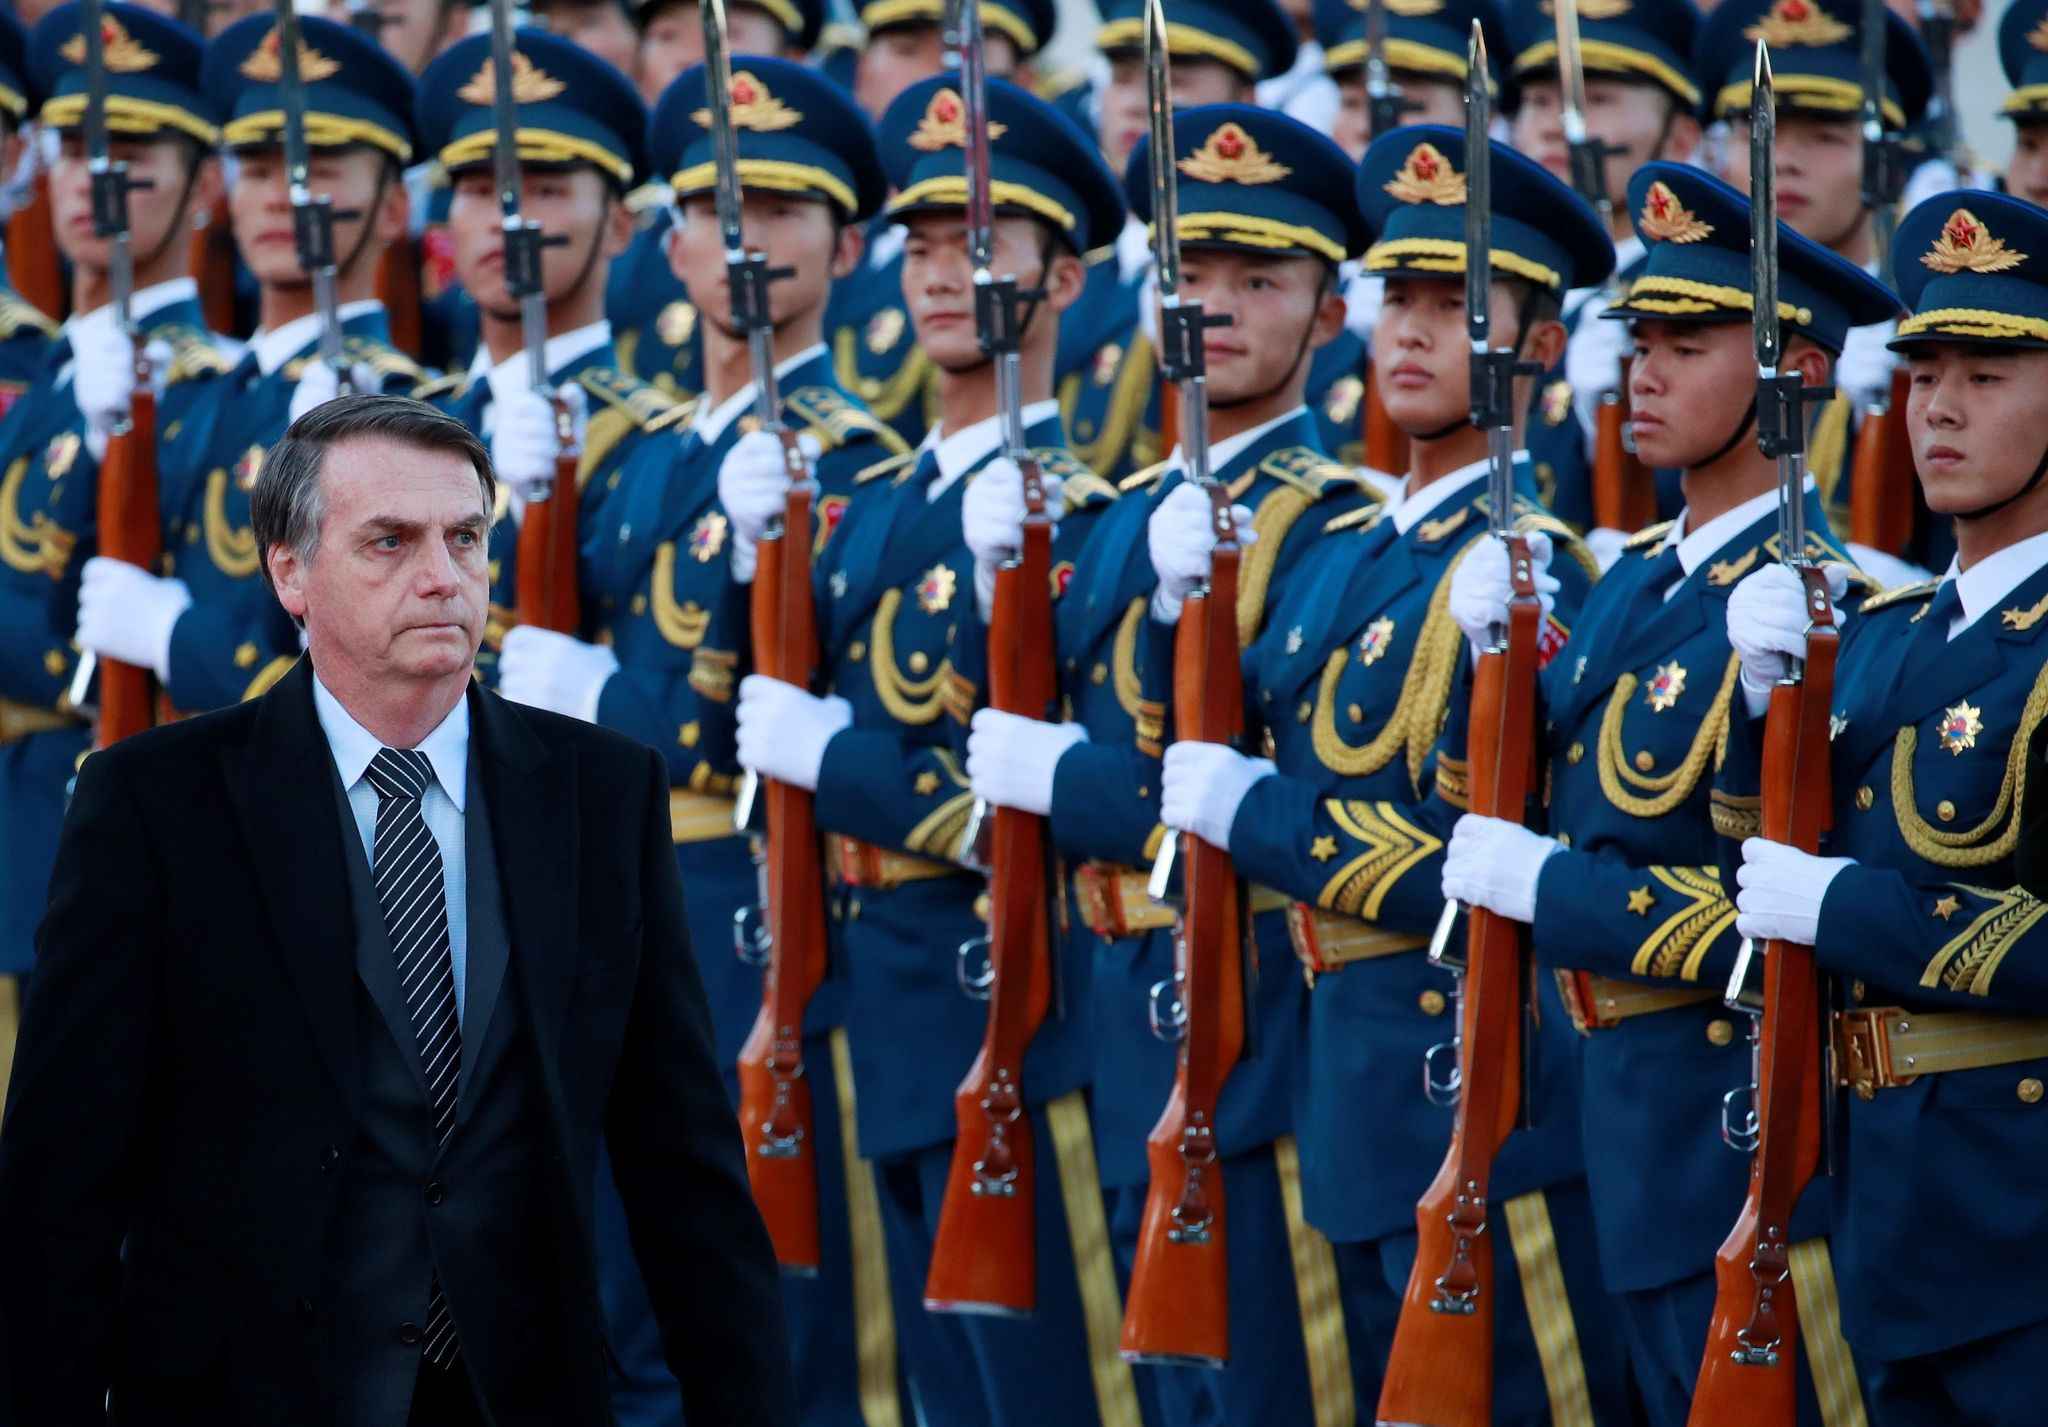 -FOTODELDÍA- HHY13. PEKÍN (CHINA).- El presidente de Brasil, Jair...